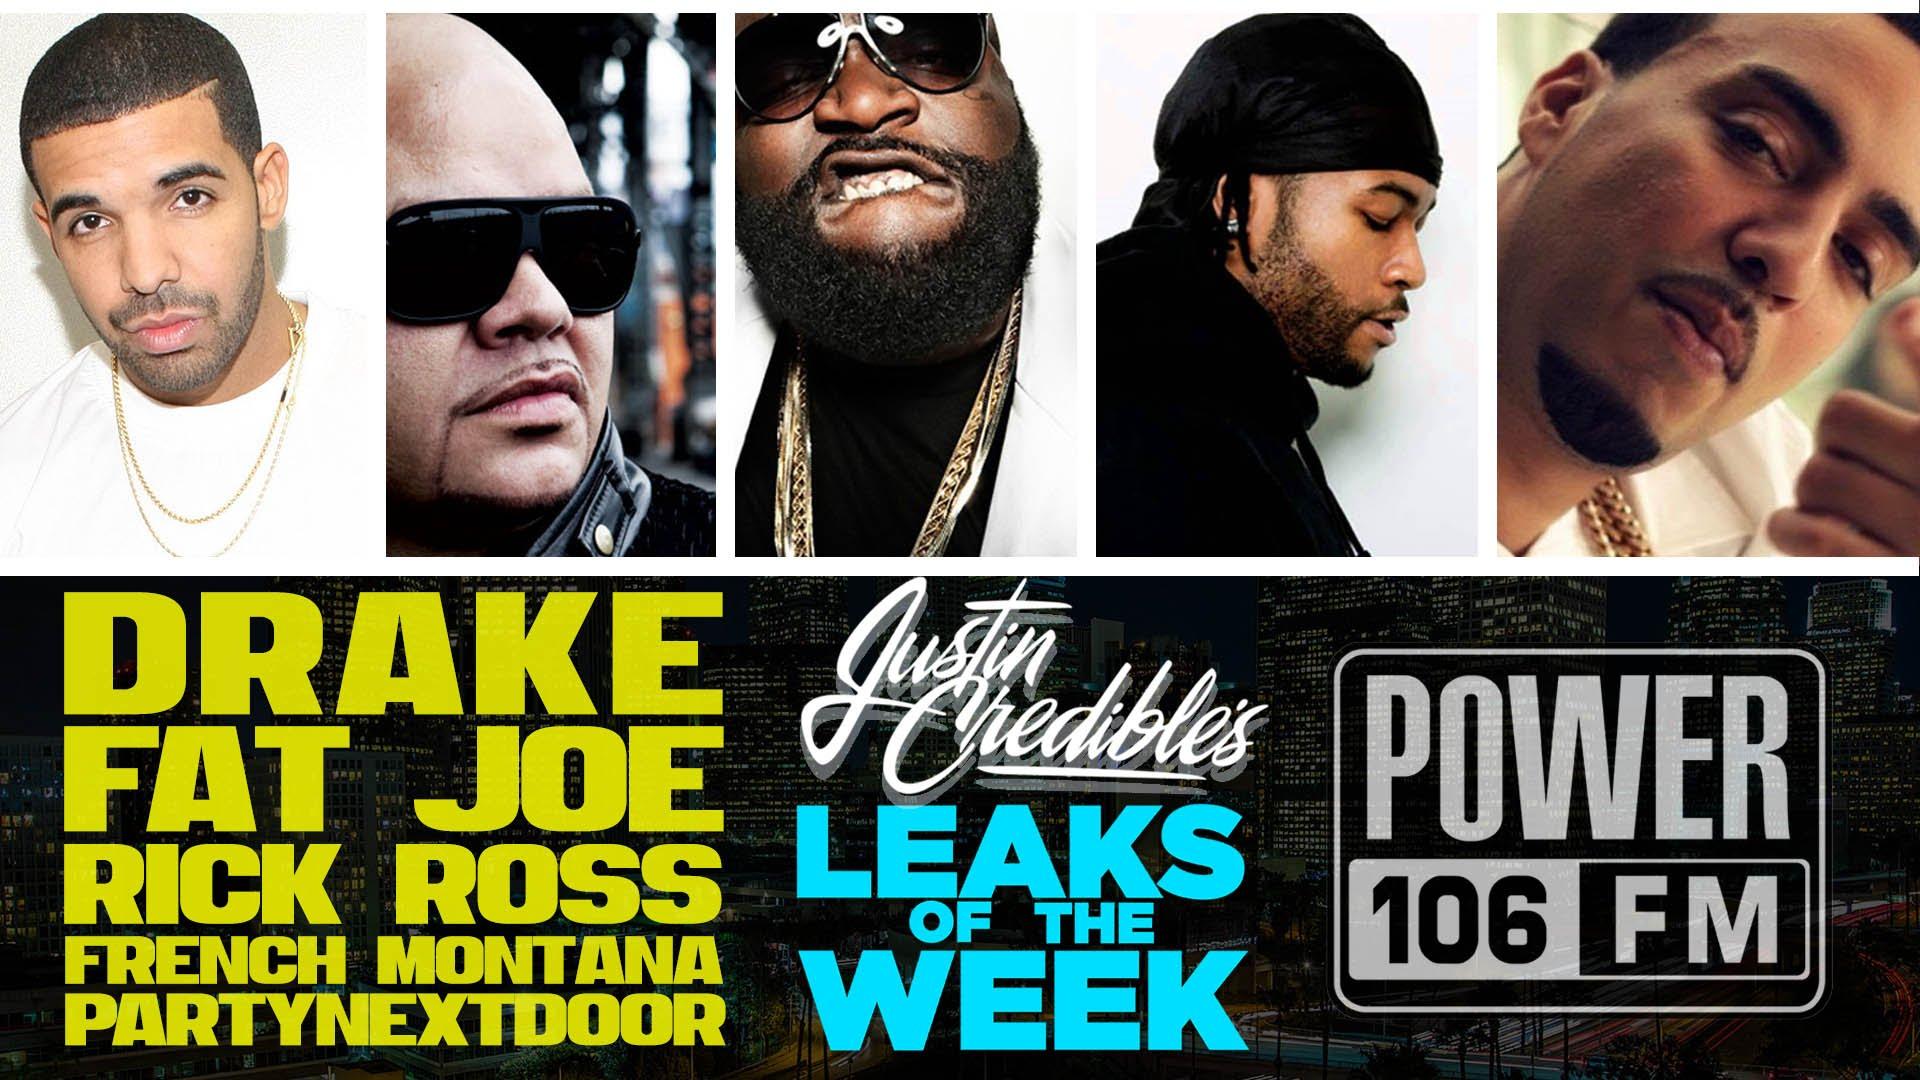 Justin Credible's #LeaksOfTheWeek w/ Fat Joe, PARTYNEXTDOOR, J.U.S.T.I.C.E League (Video)